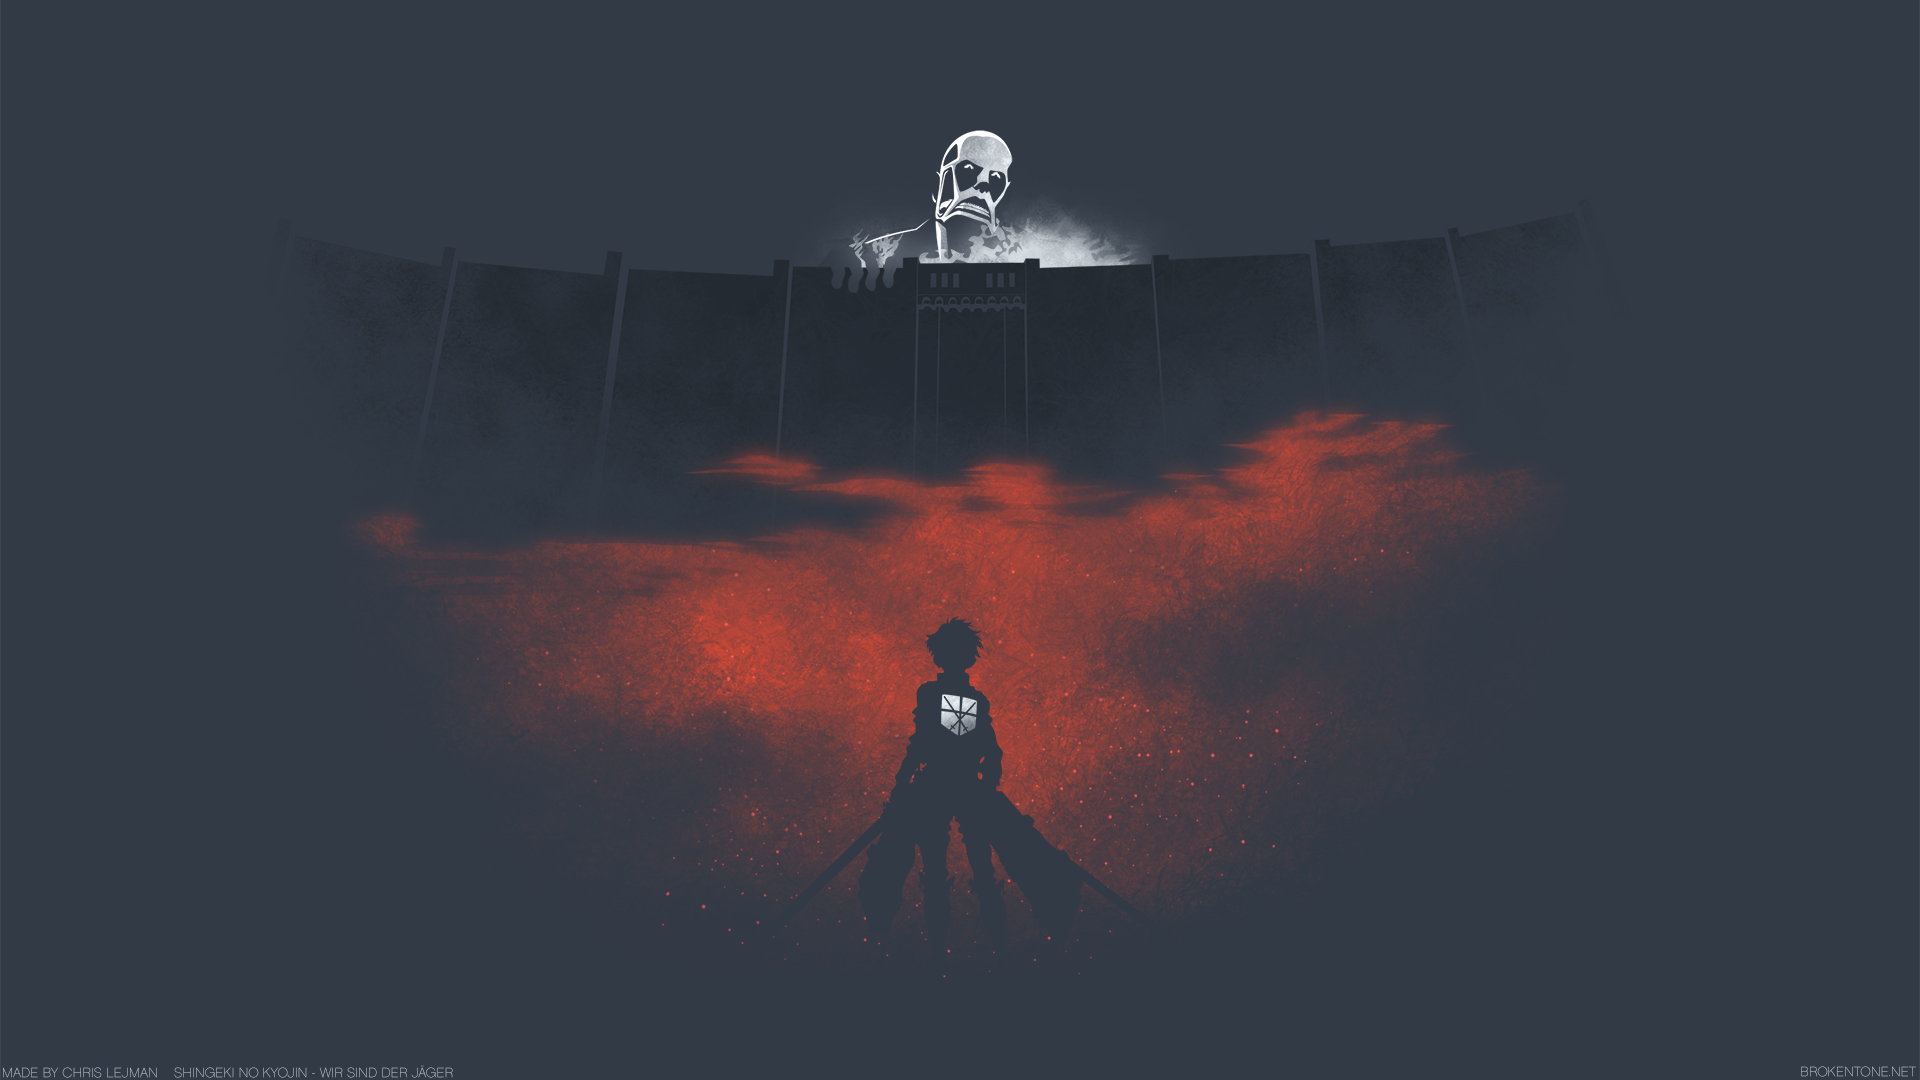 G Shingeki No Kyojin Eren Yeager Bertolt Hoover Attack On Titan Wallpaper Simple 1920x1080 Wallpaper Teahub Io